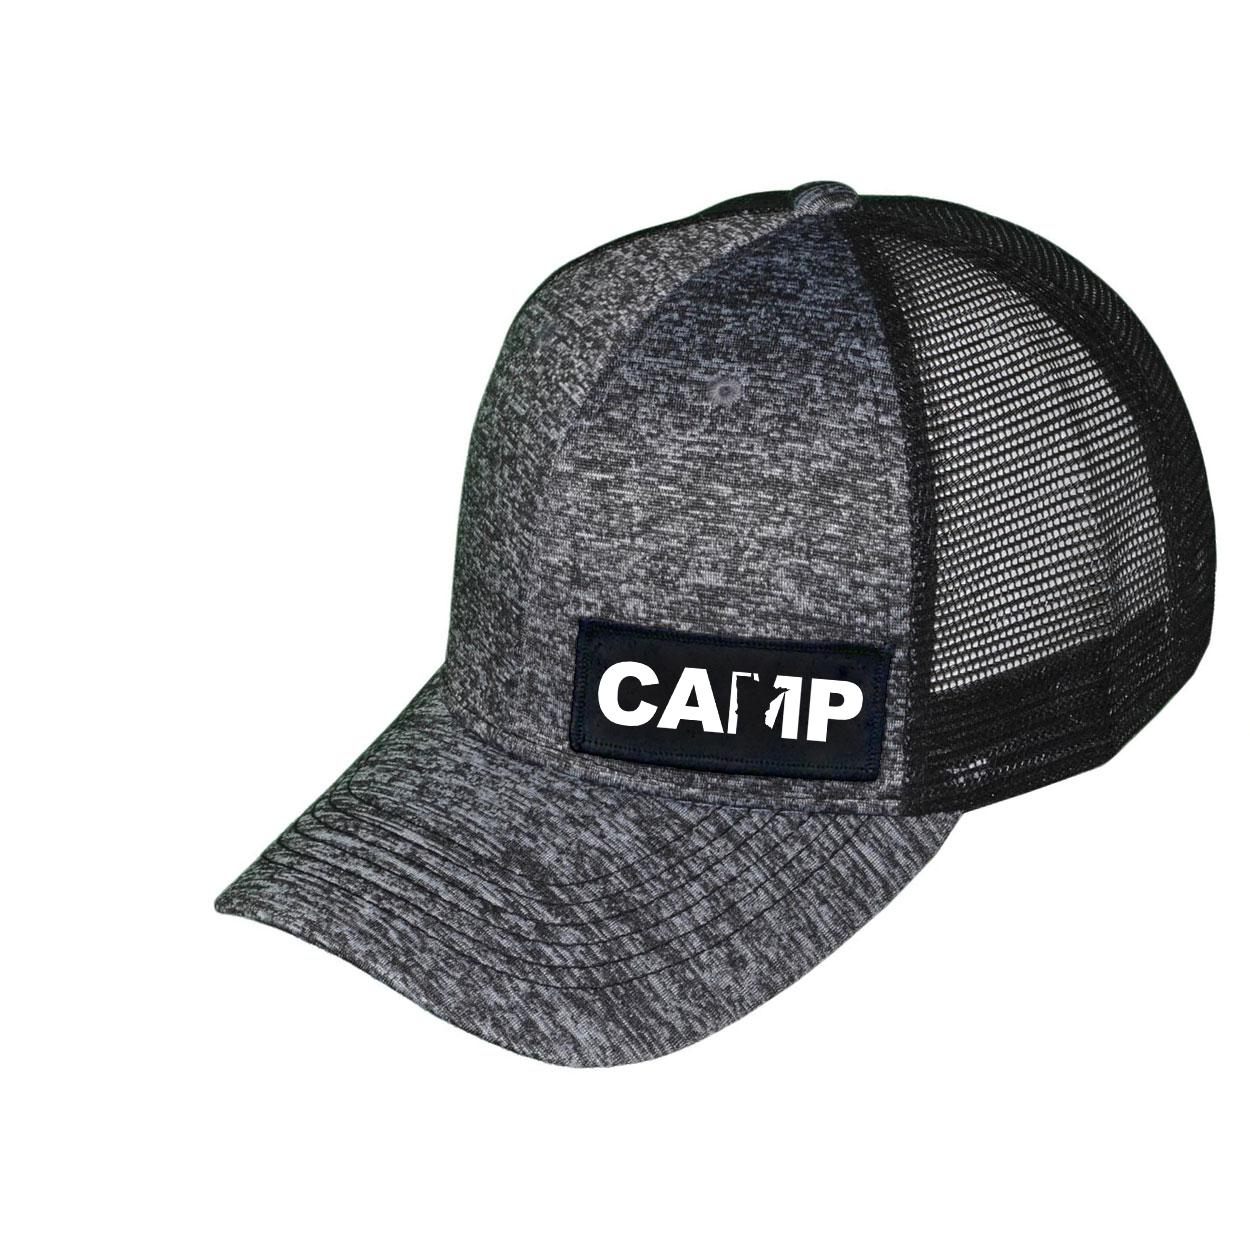 Camp Minnesota Night Out Woven Patch Melange Snapback Trucker Hat Gray/Black (White Logo)